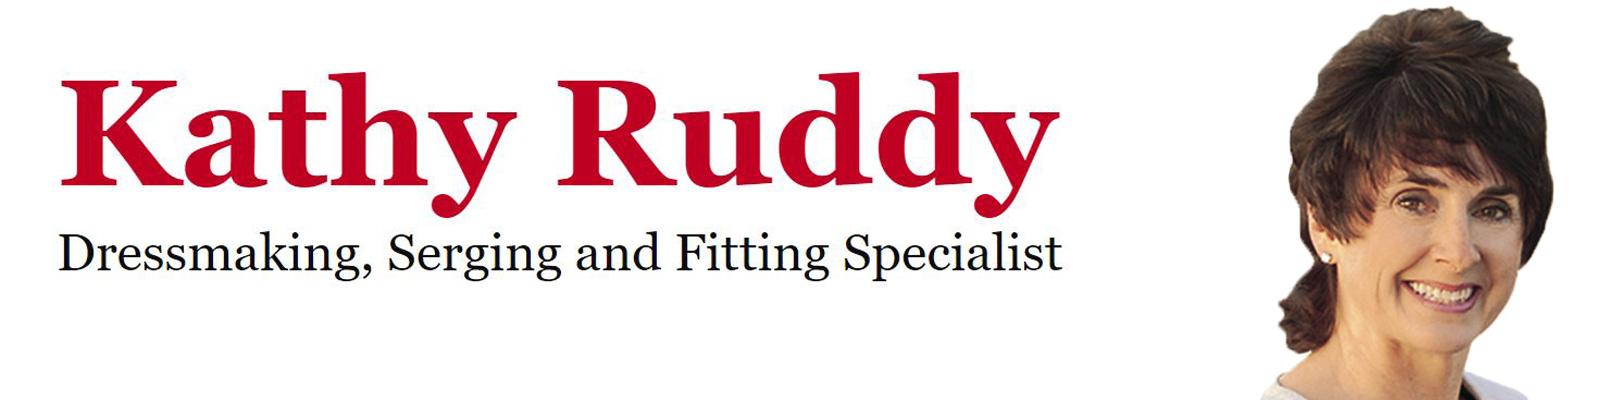 kathy-ruddy-designs.jpg